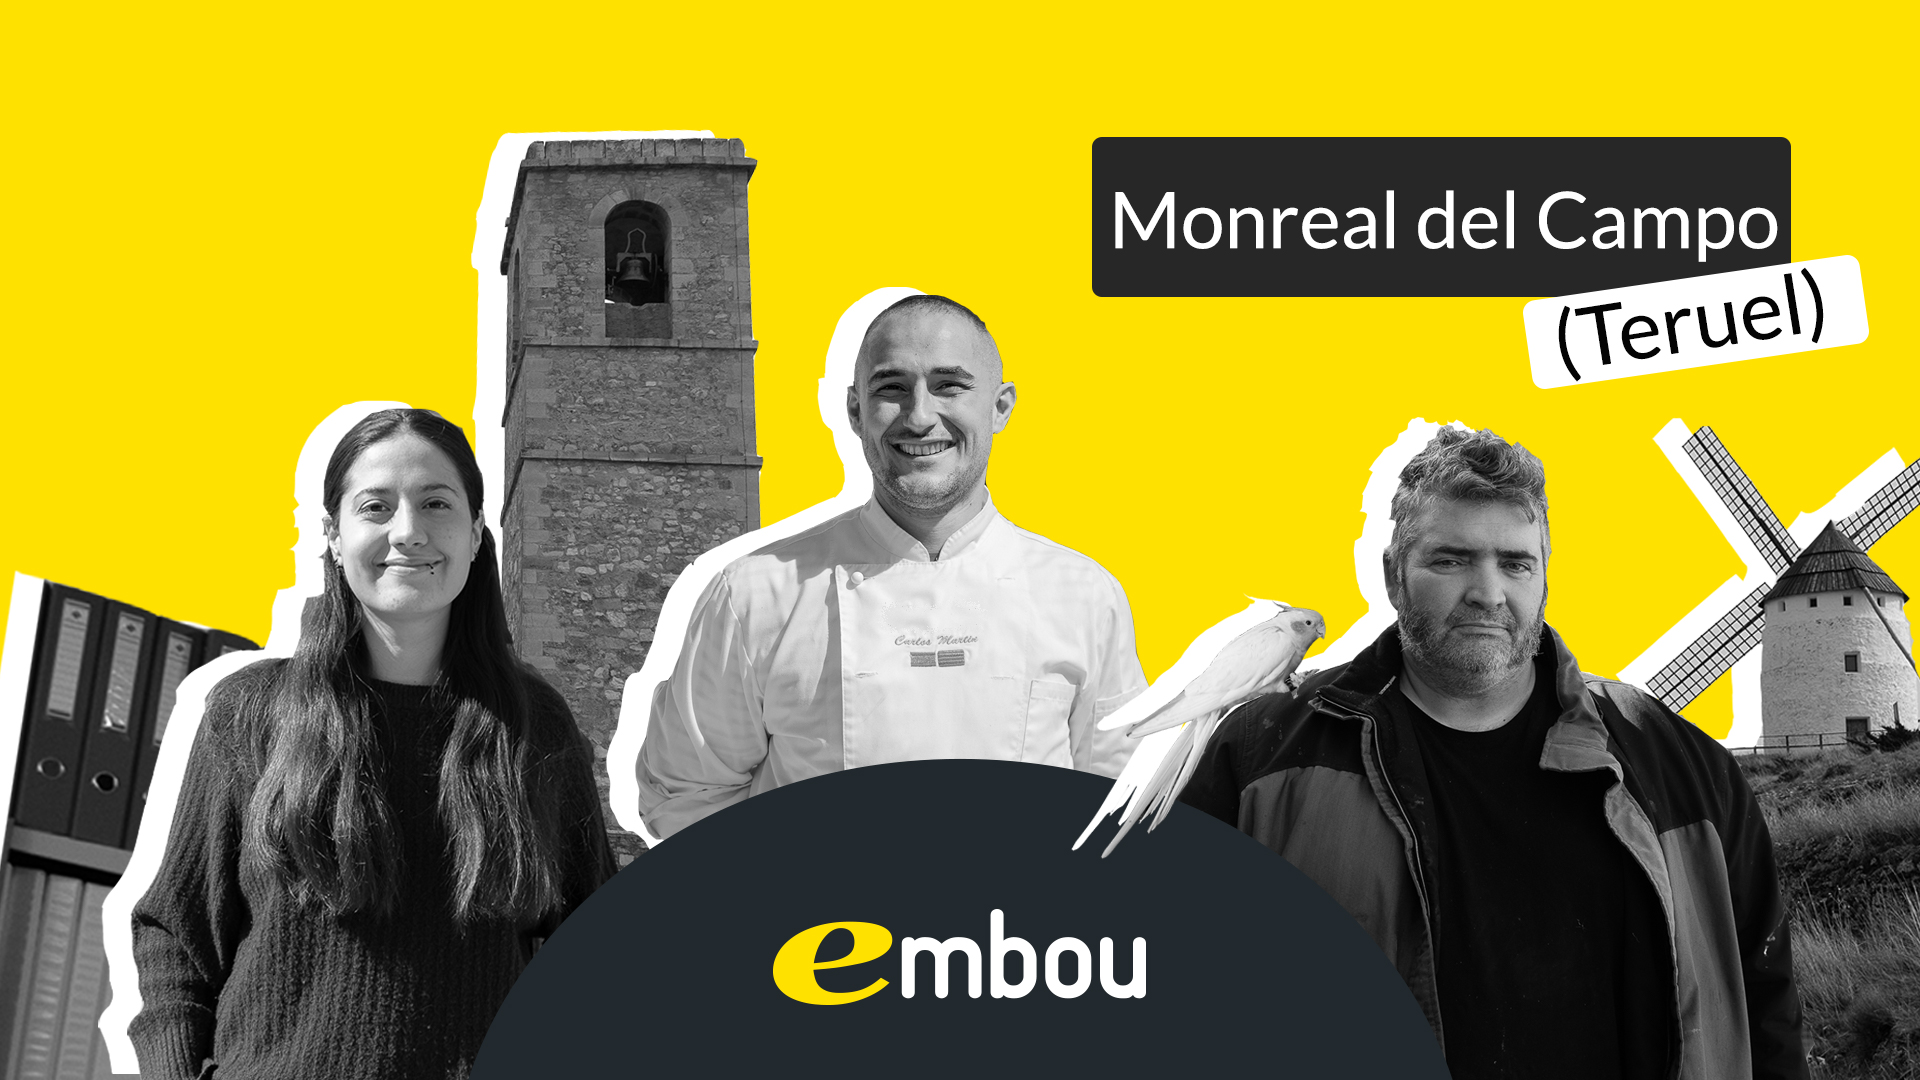 Embou_Monreal_Portada_VIDEO1080